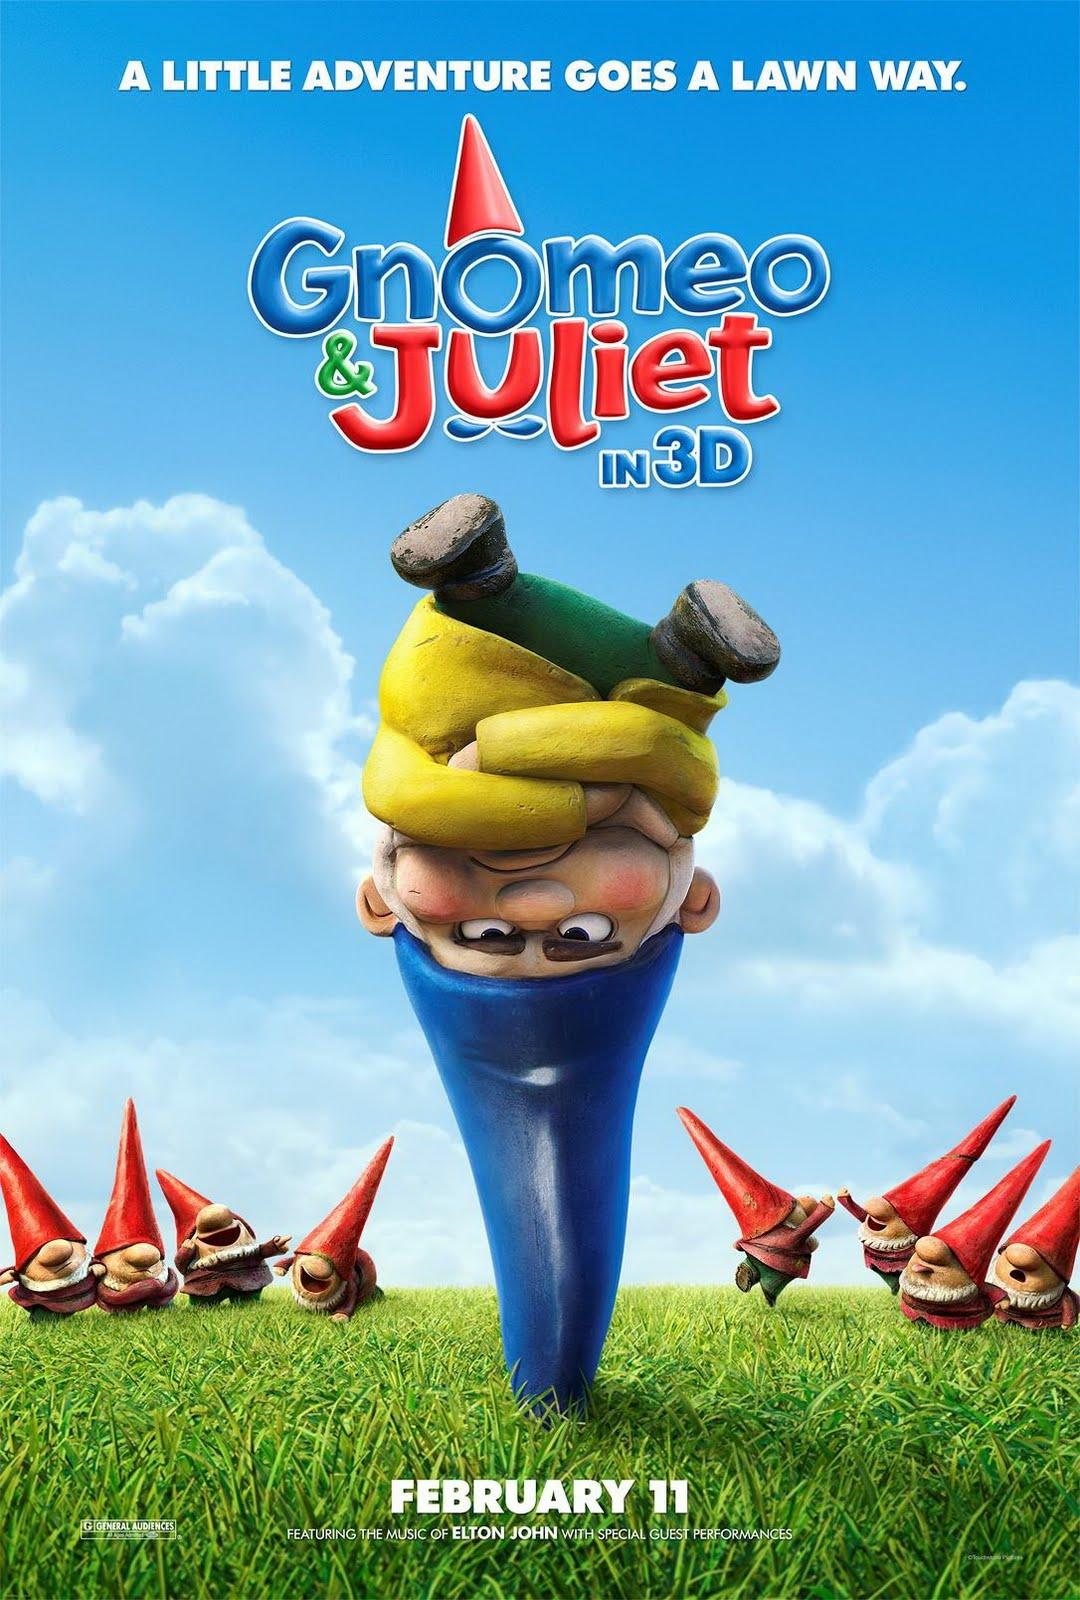 http://3.bp.blogspot.com/_whISsOKJZ5Y/TQ0nuWxaymI/AAAAAAAAADY/PaIh0tauk0s/s1600/Gnomeo%2Band%2BJuliet%2BMovie%2BPoster.jpg